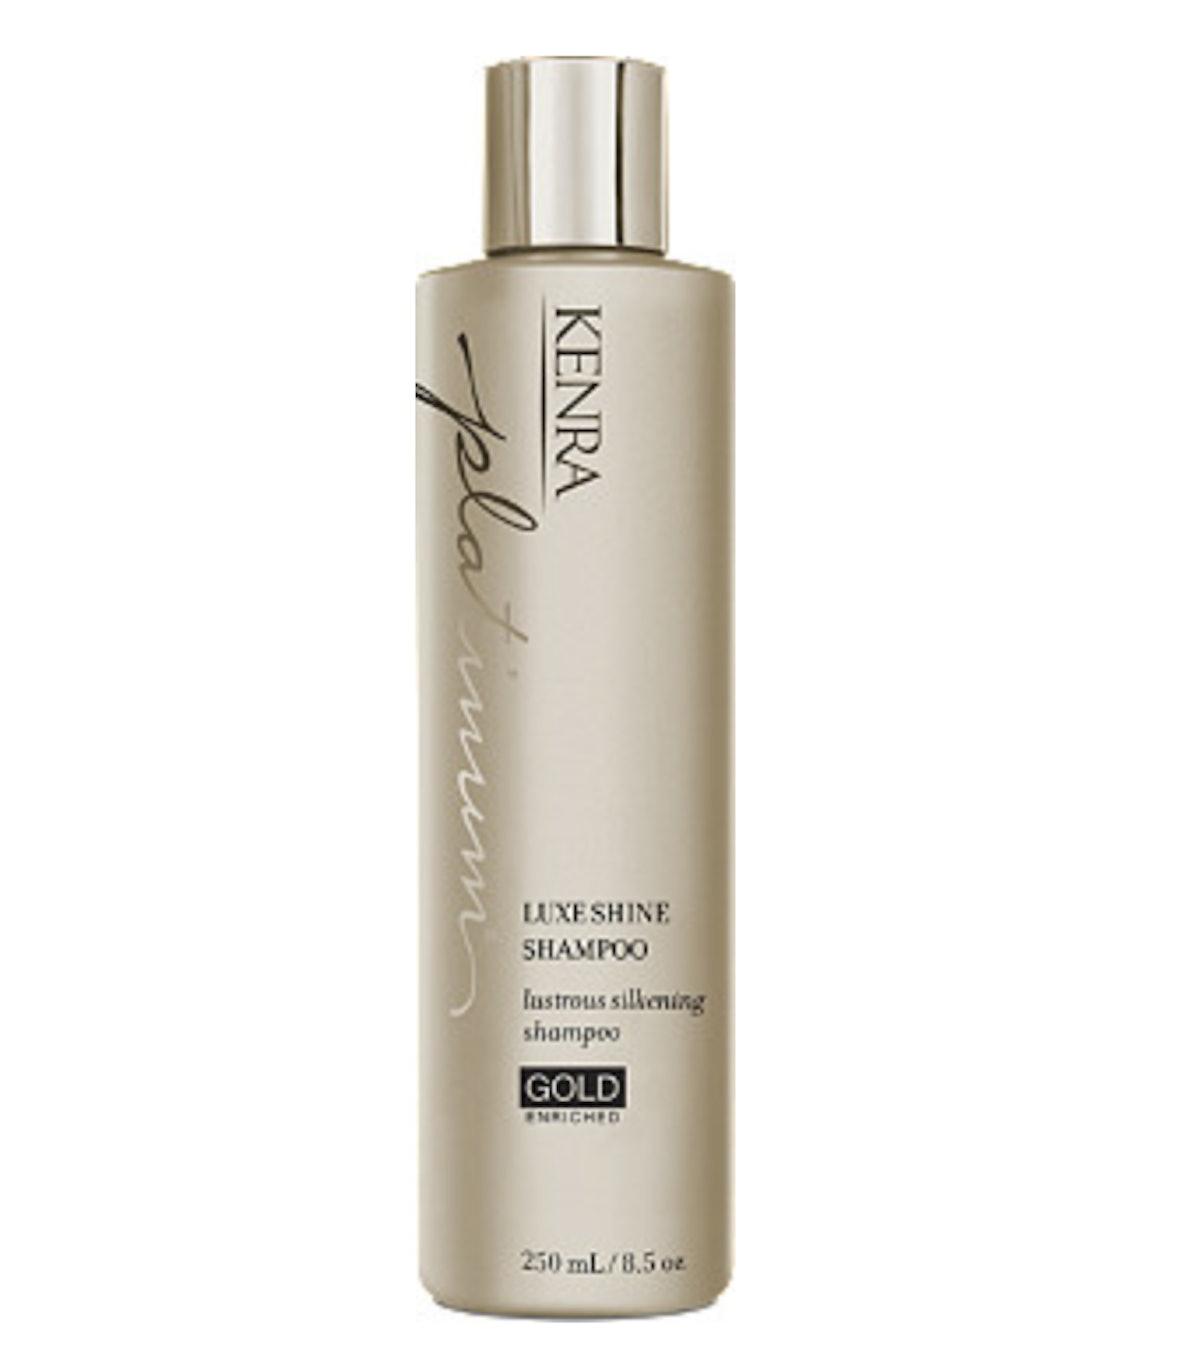 Platinum Luxe Shine Shampoo